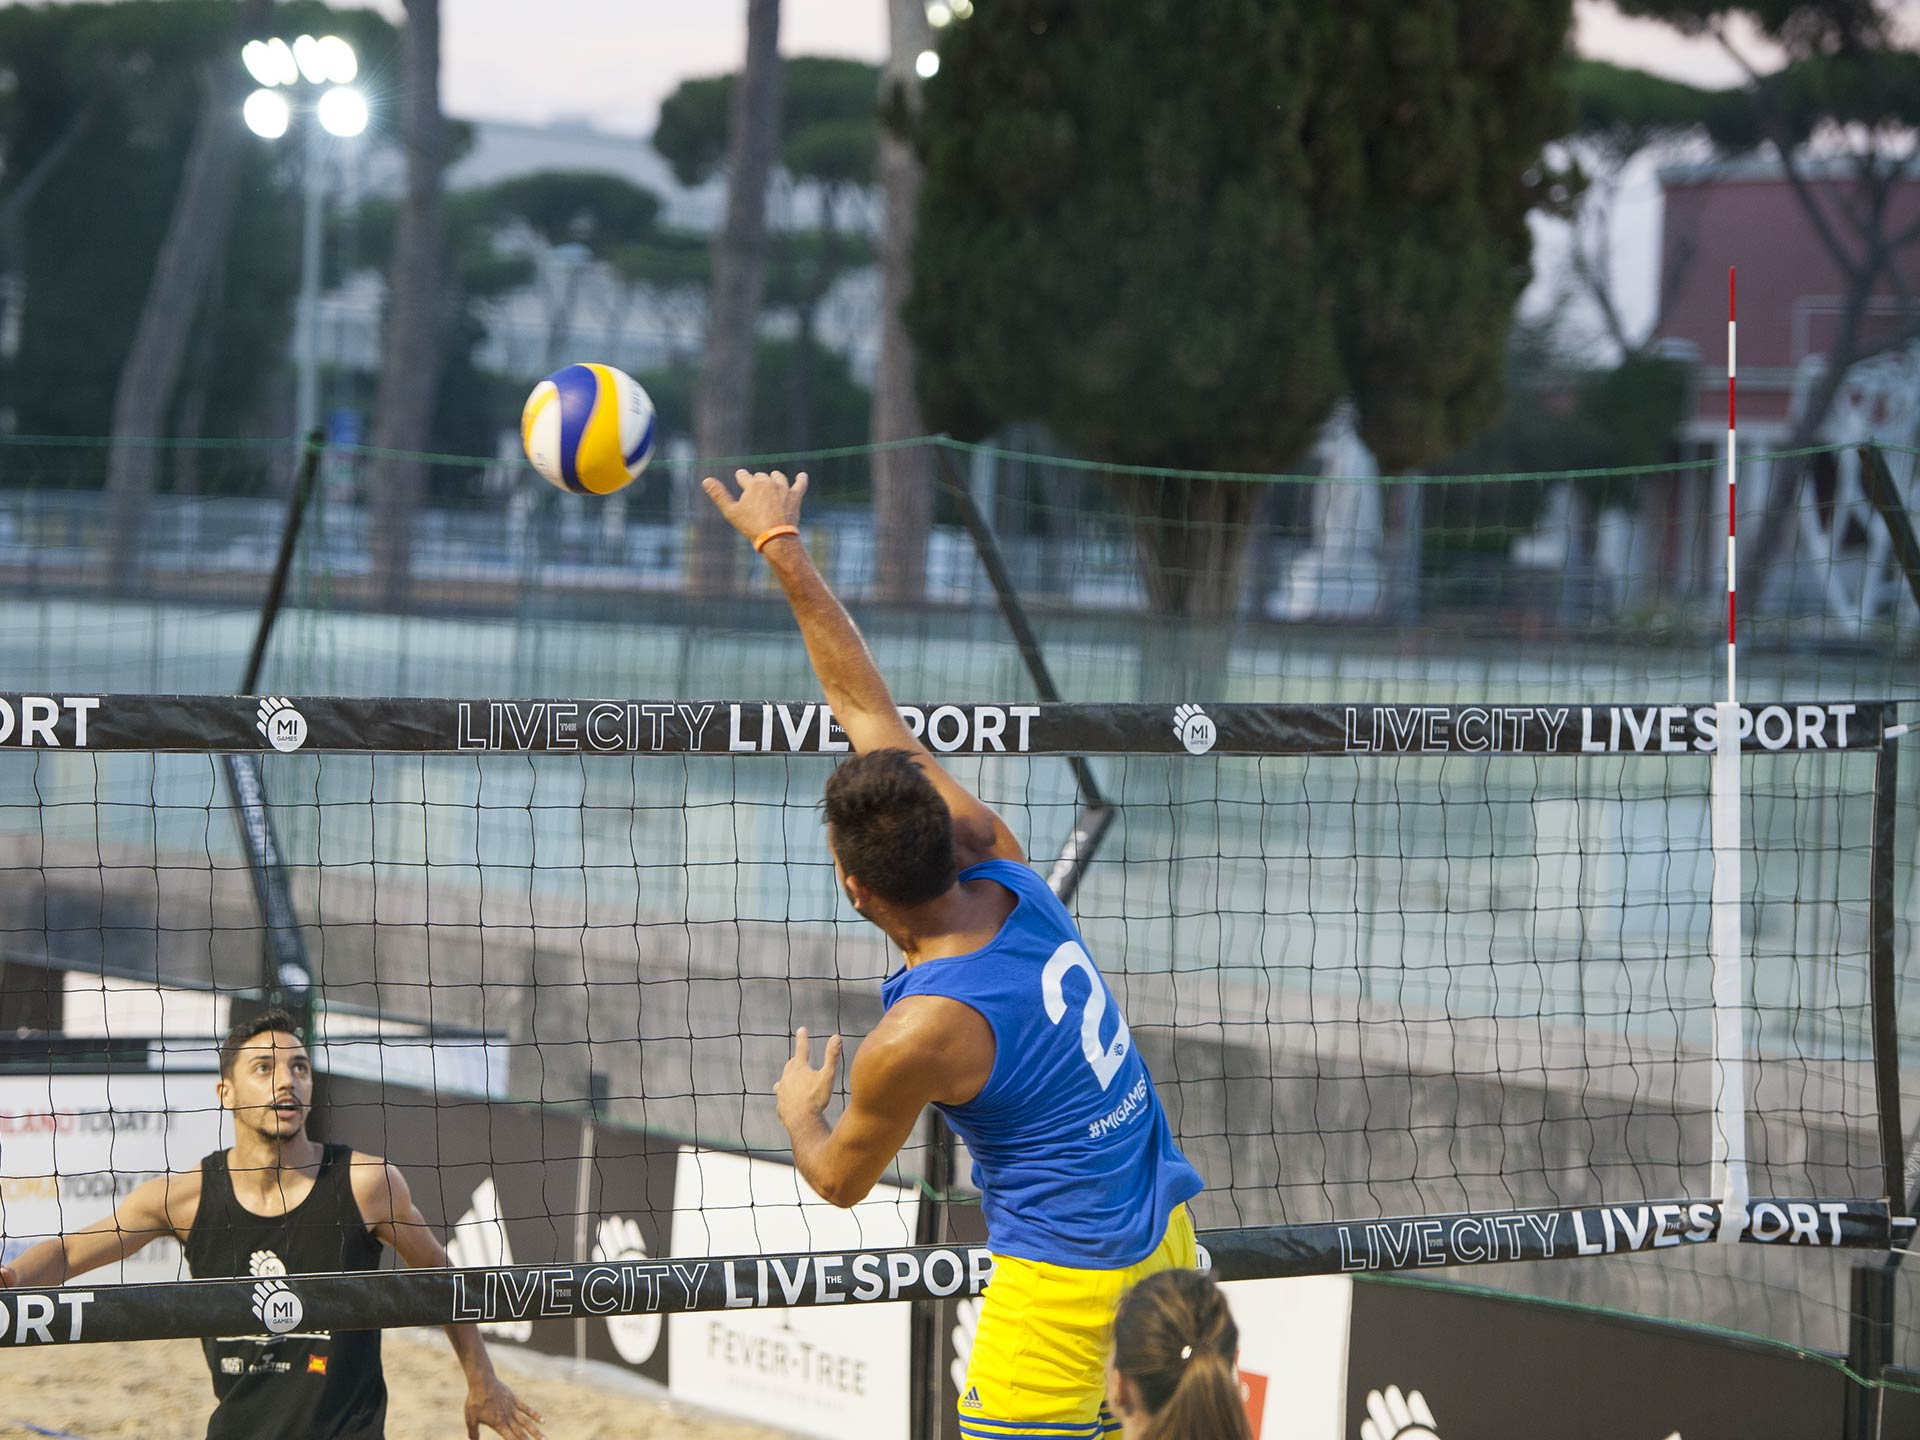 Rete beach volley - Noleggicoampi.it